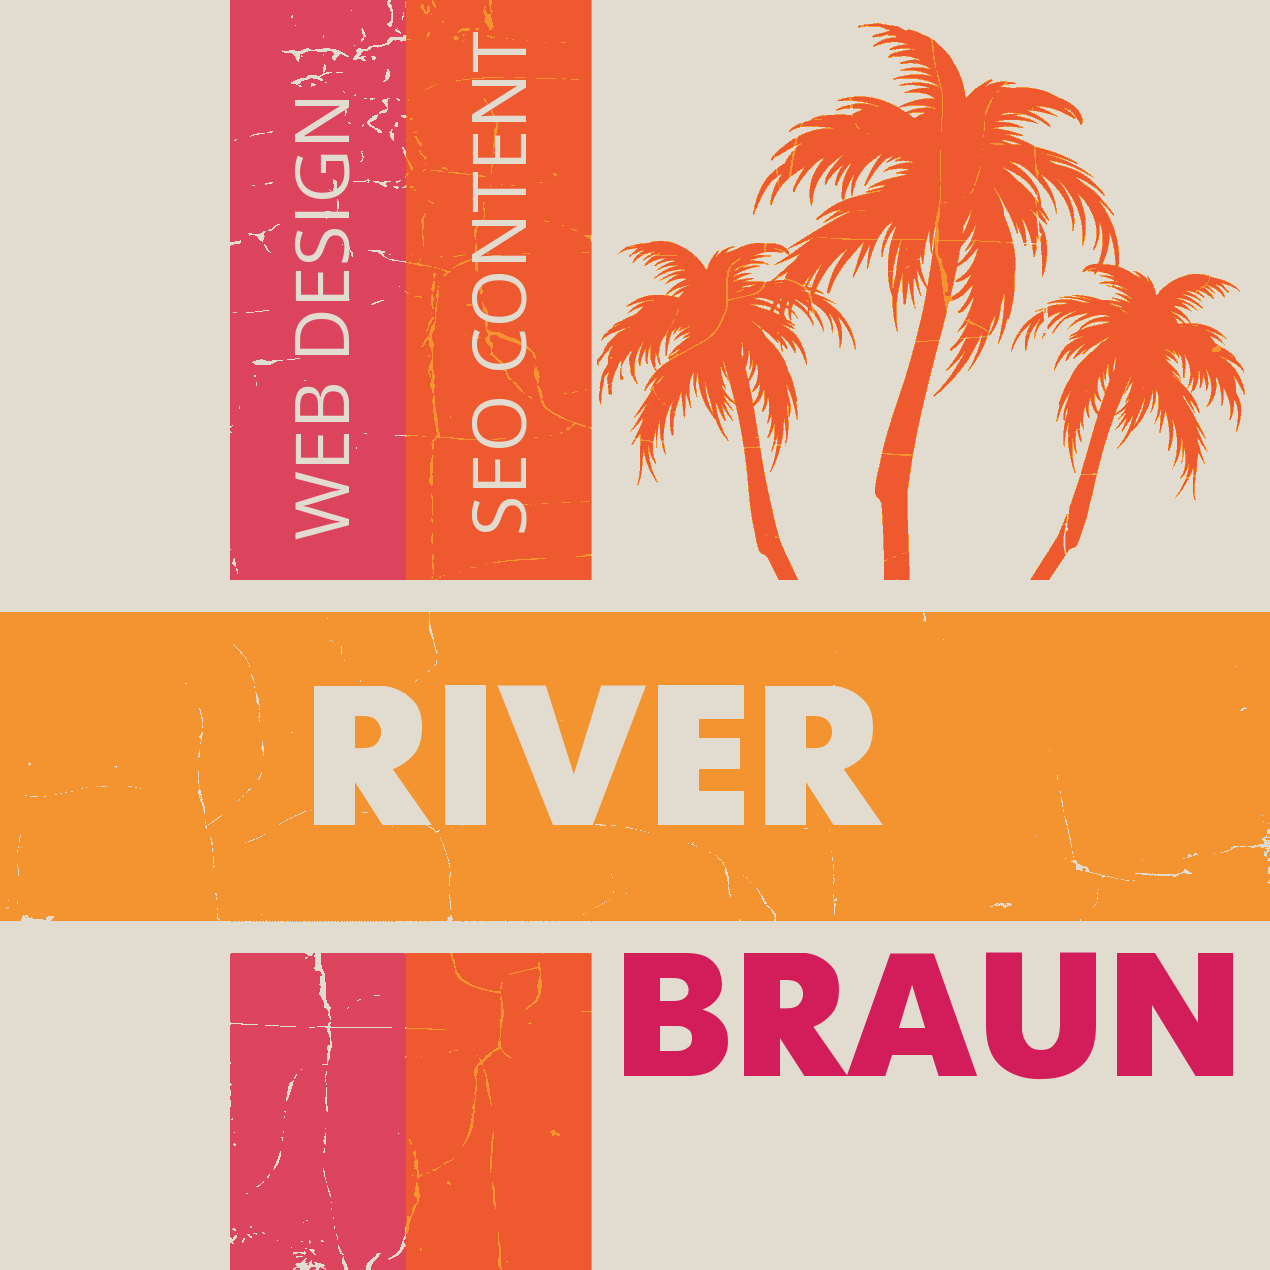 River Braun - SEO Content Marketing